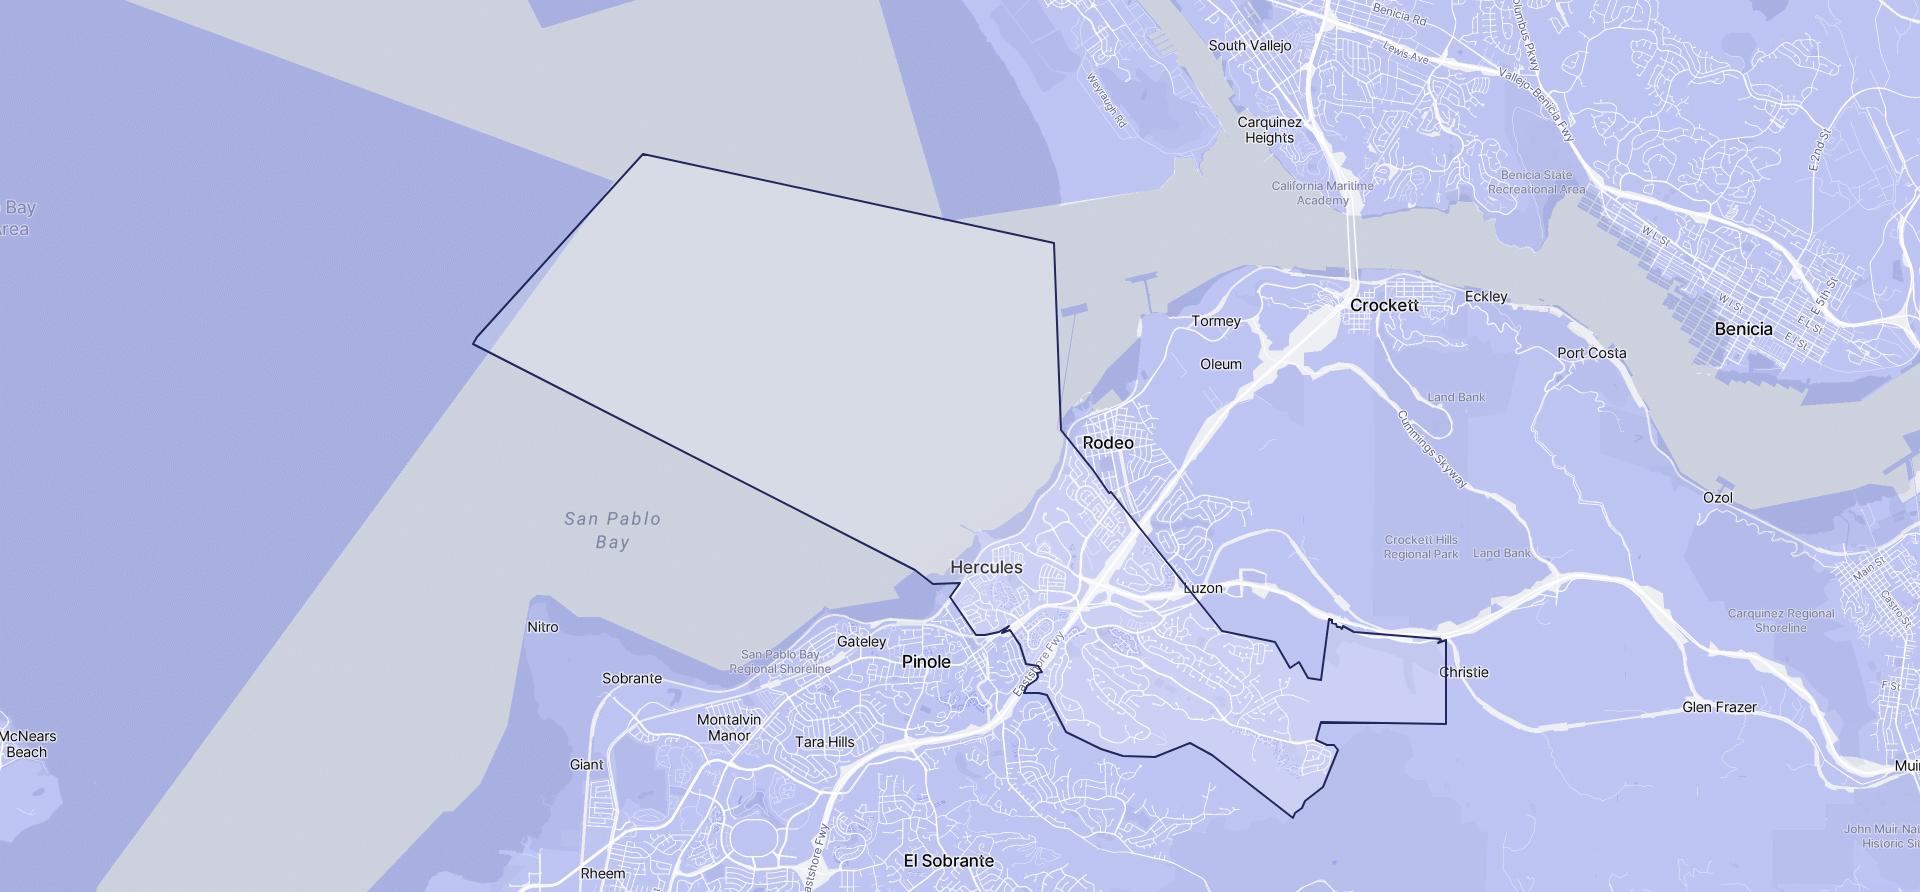 Image of Hercules boundaries on a map.